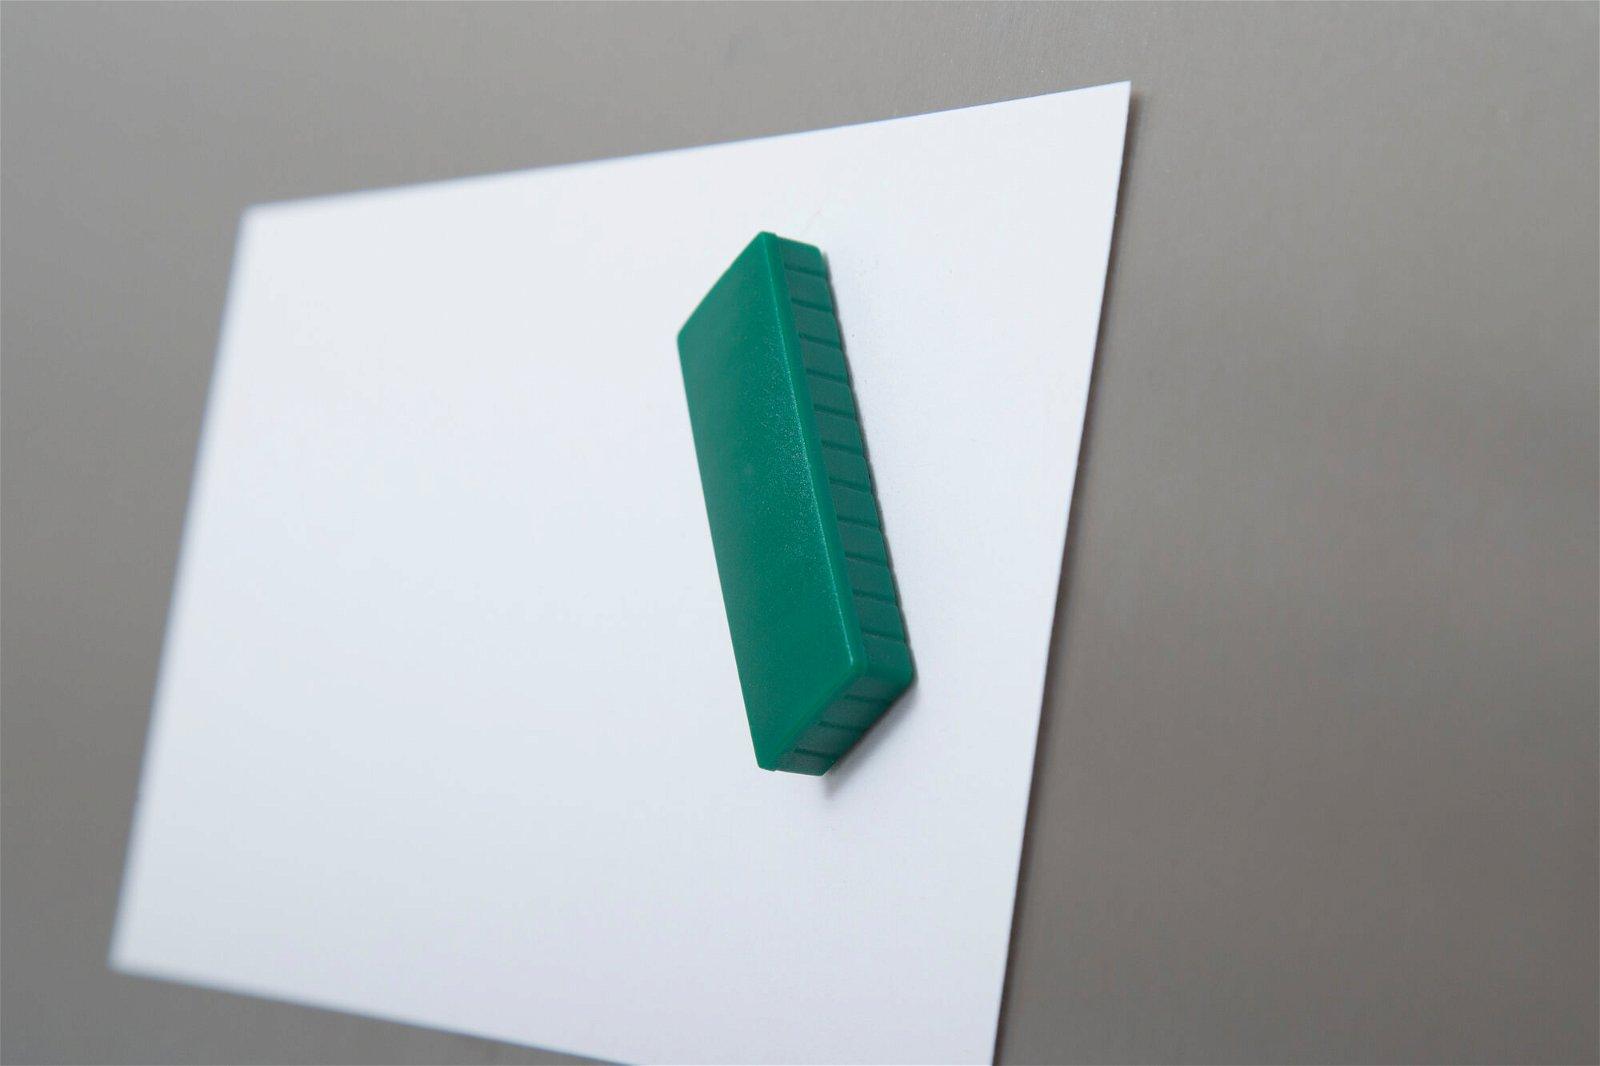 Magnet MAULsolid 54 x 19 mm, 1 kg Haftkraft, 10 St./Ktn., grün